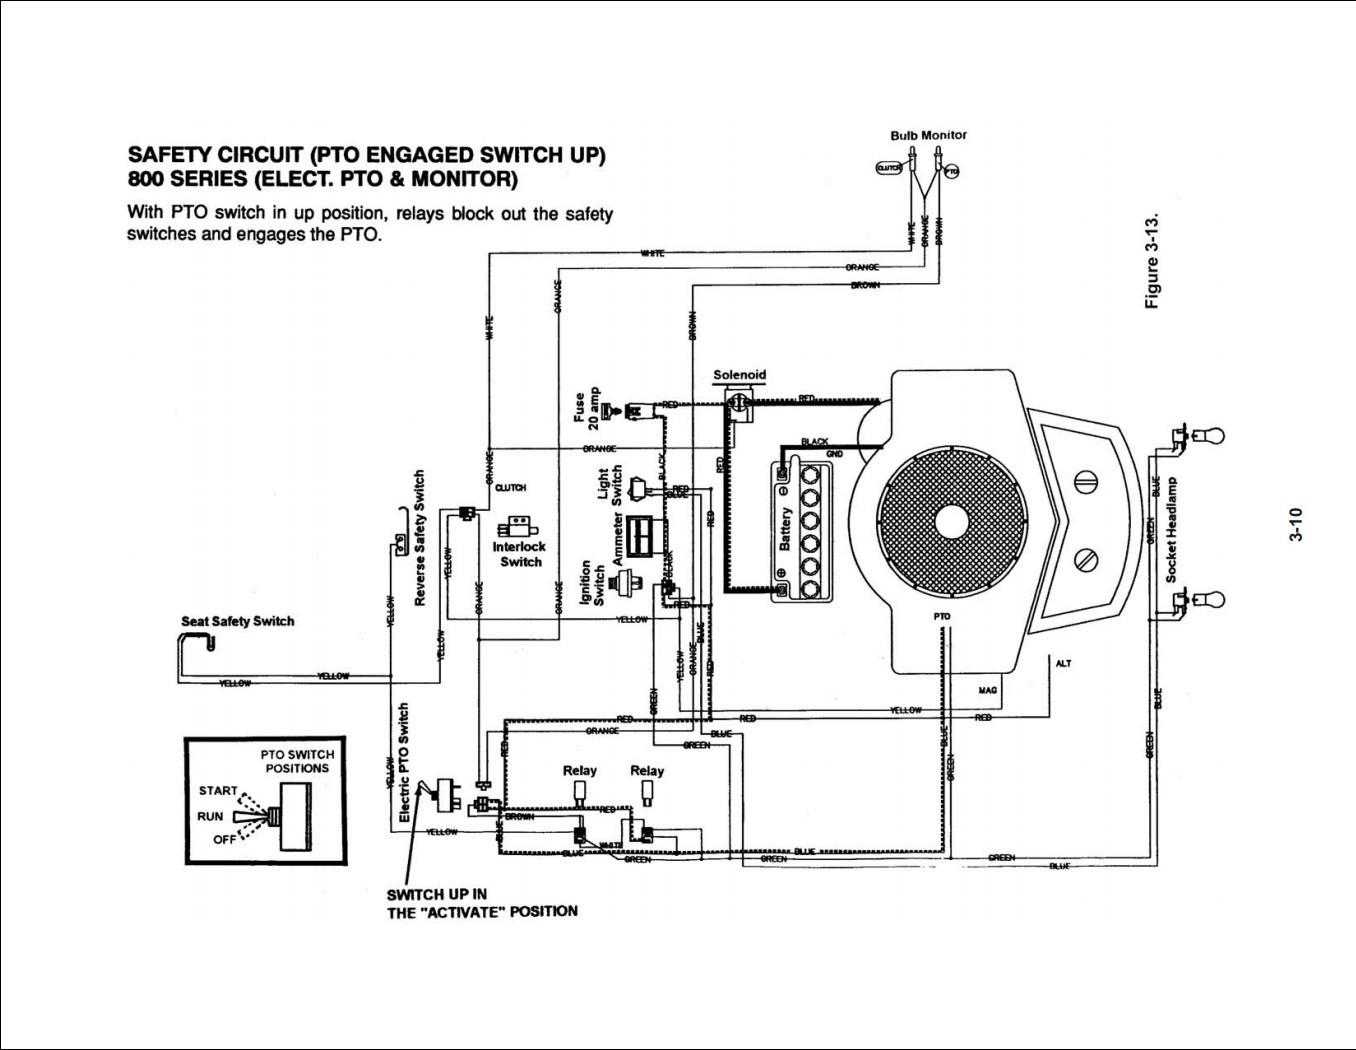 Briggs and stratton starter solenoid wiring diagram awesome wiring briggs and stratton ignition coil wiring diagram new stunning swarovskicordoba Images